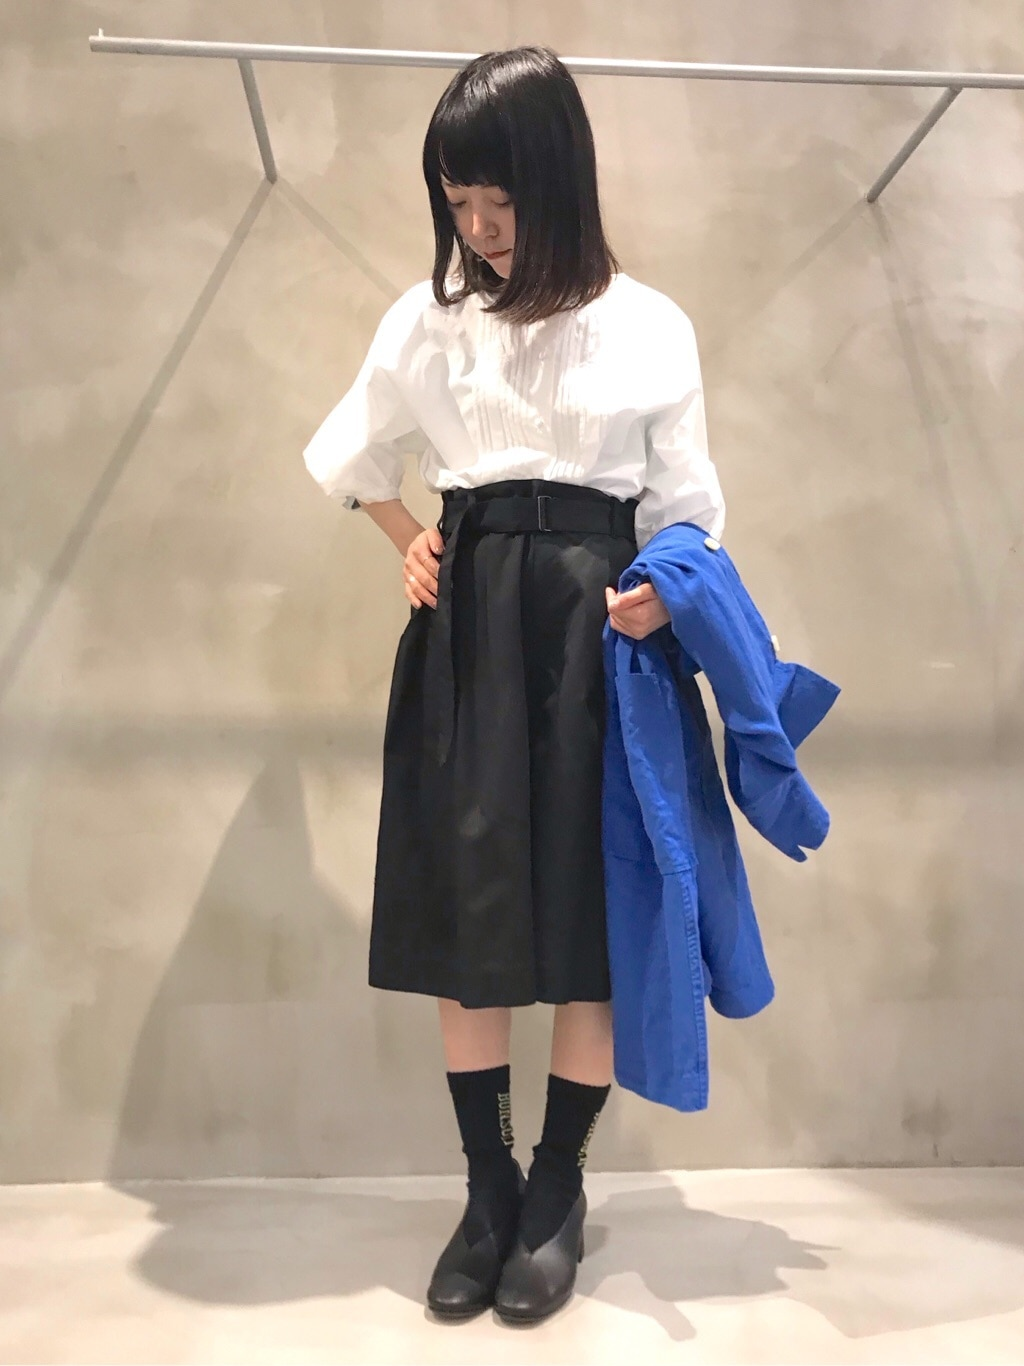 bulle de savon 渋谷スクランブルスクエア 身長:153cm 2020.04.04